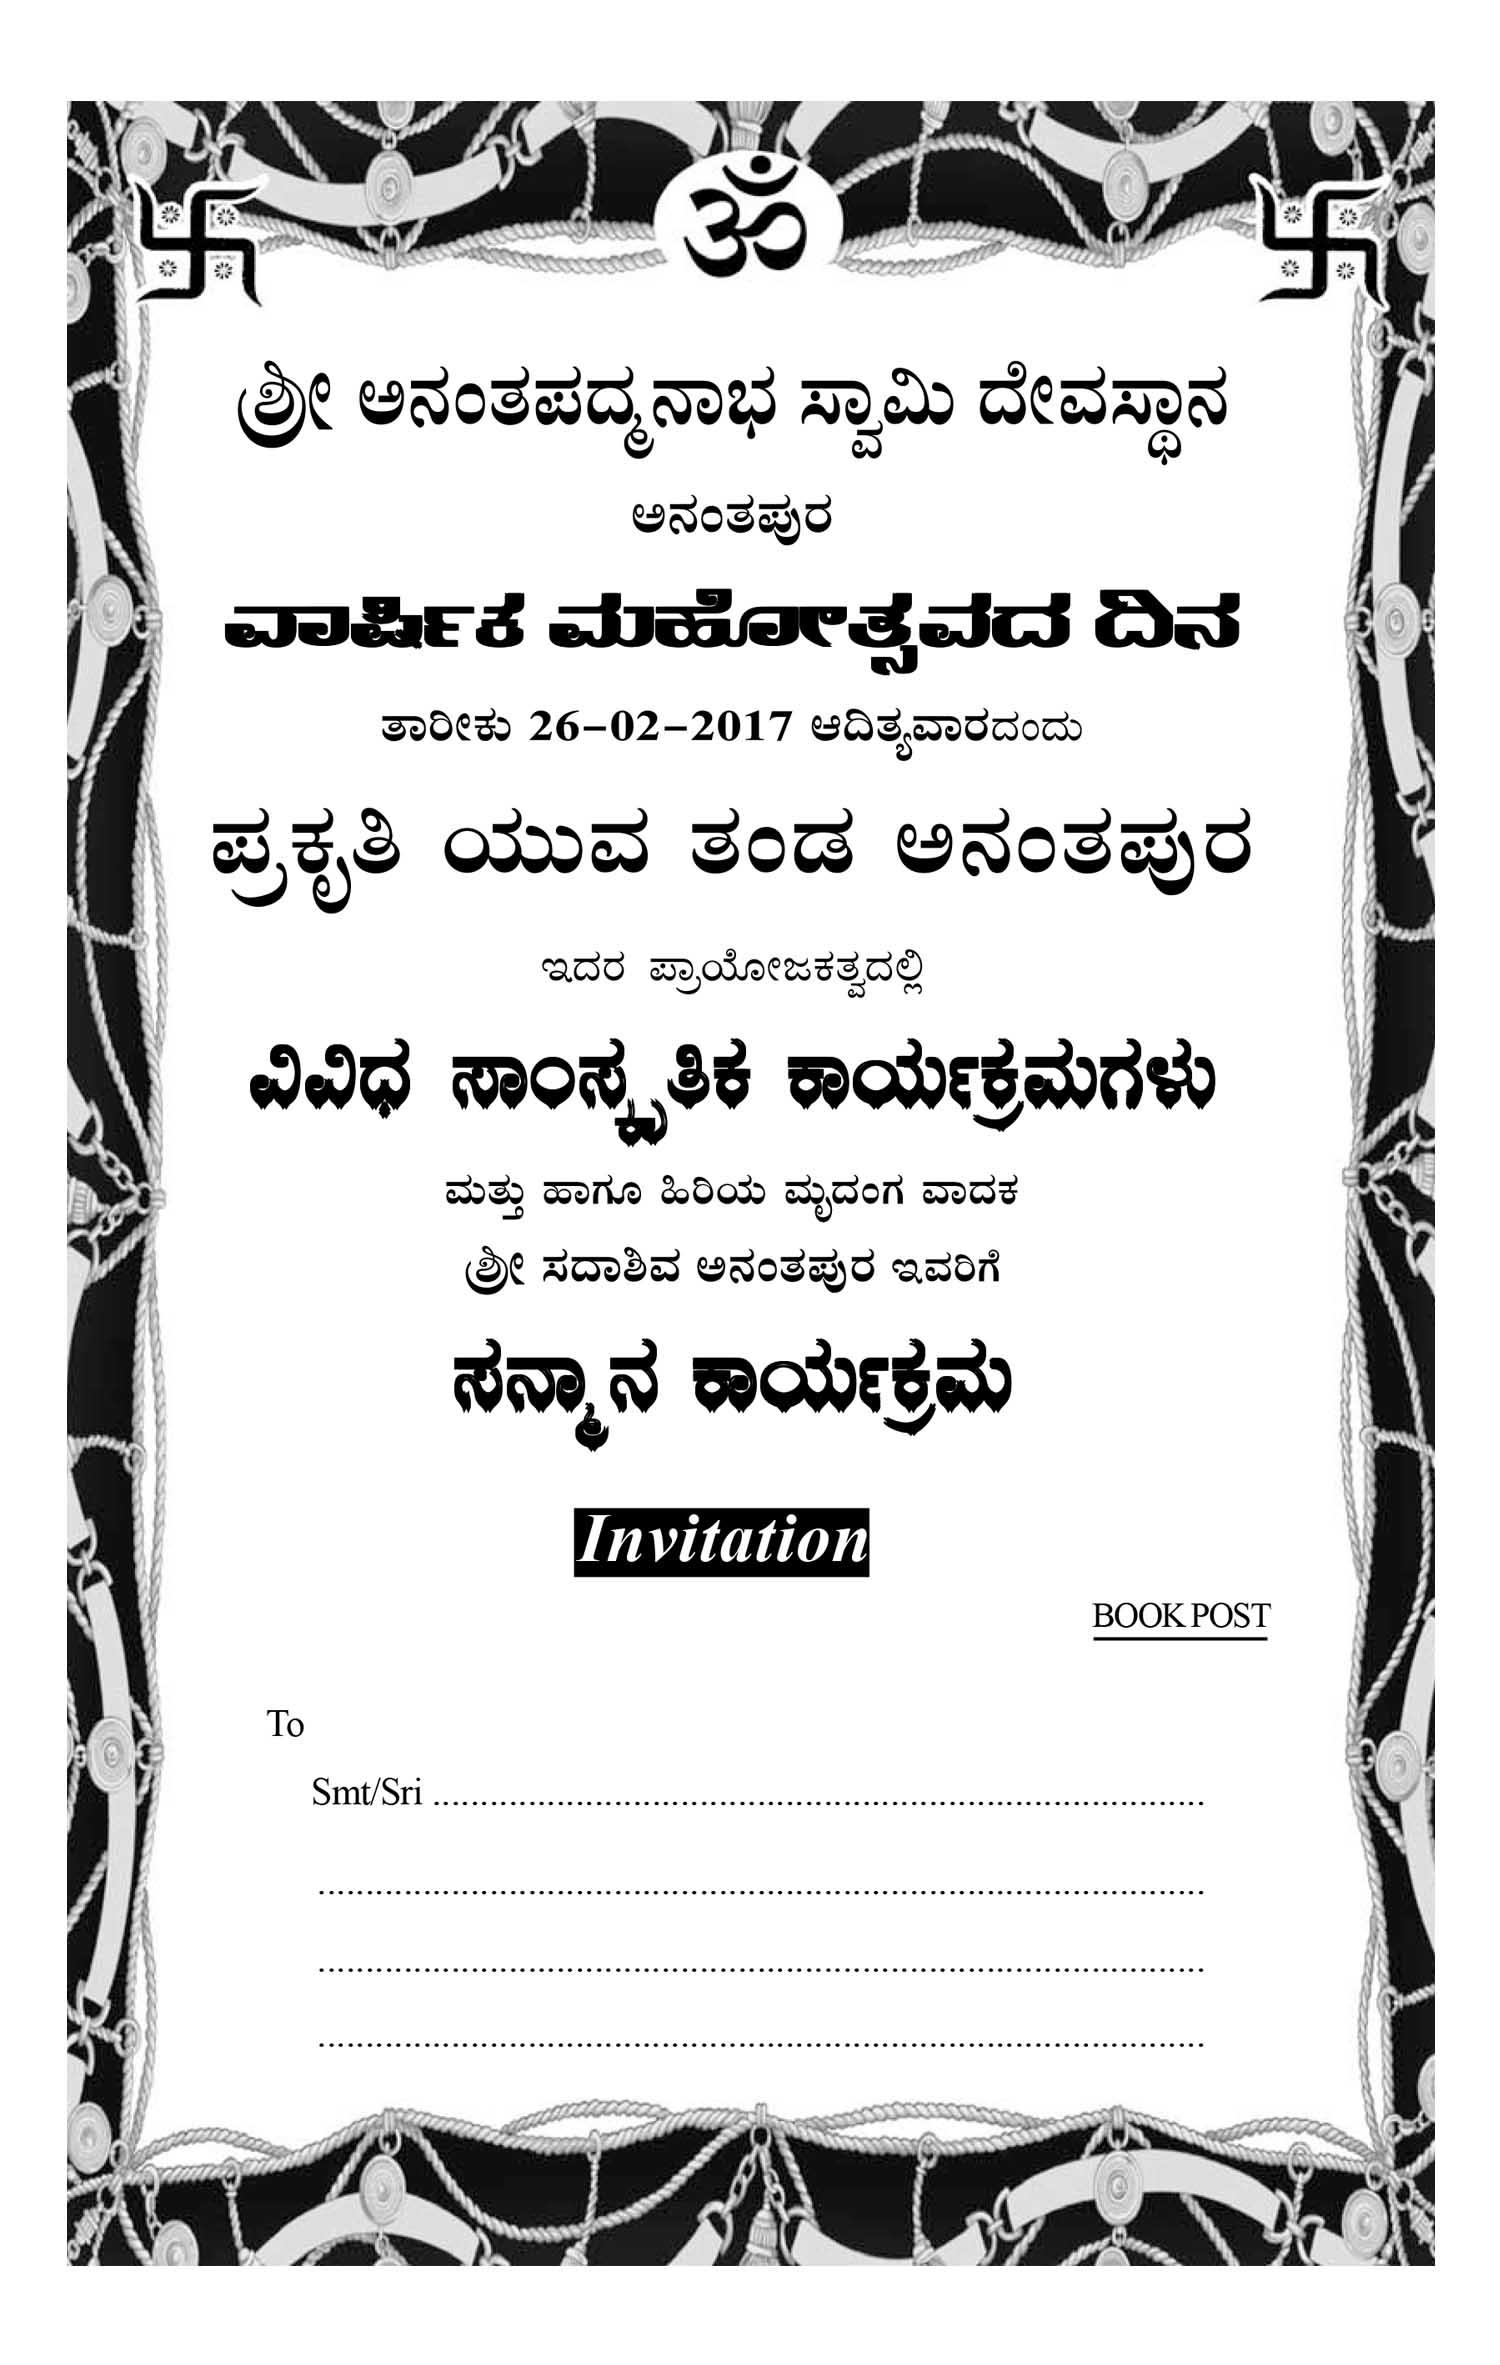 Prakrithi Yuva Thanda Cultural Programs 26-2-2017 1